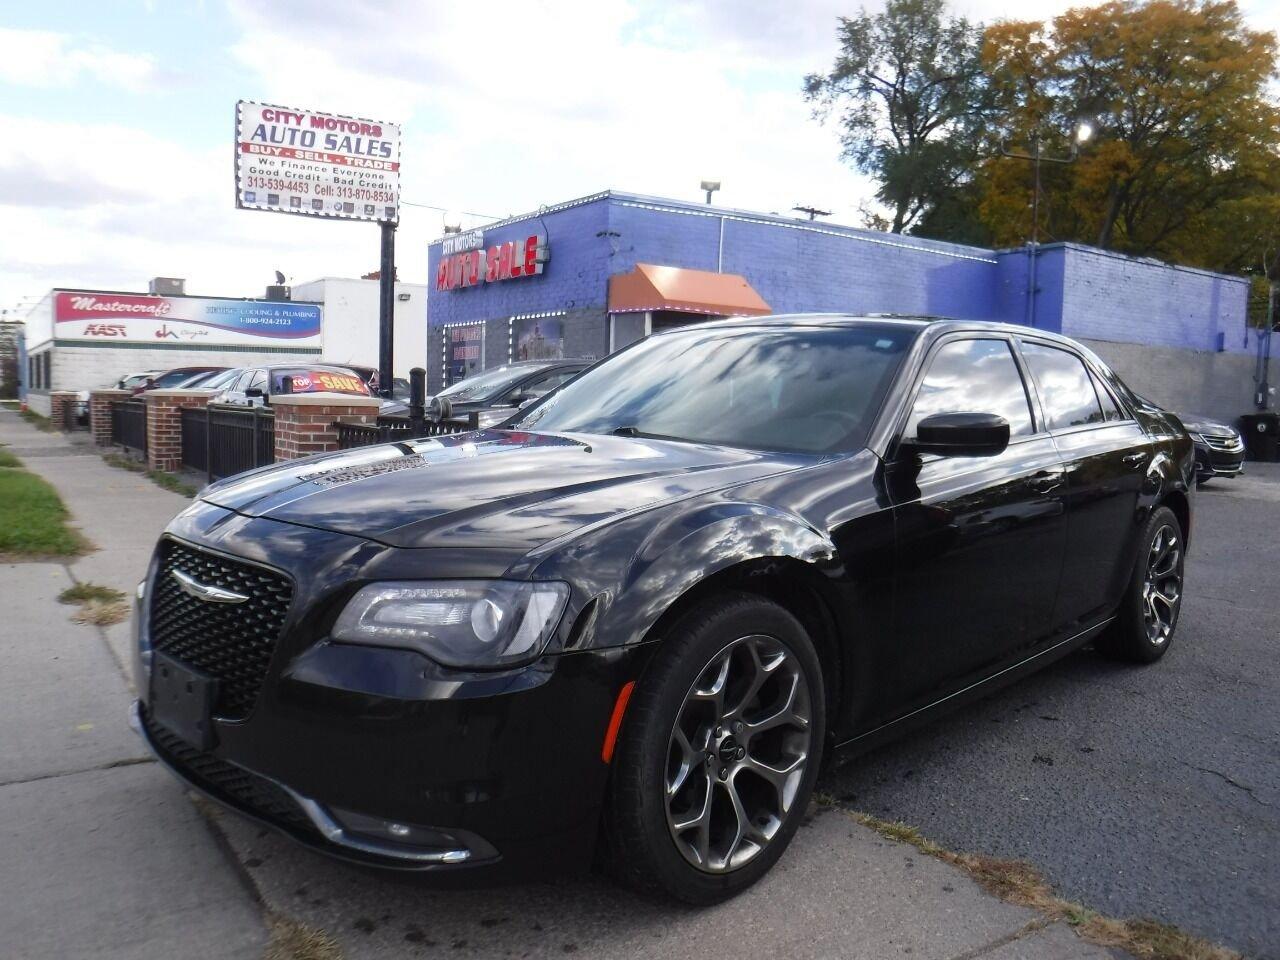 City Motors Auto Sale LLC